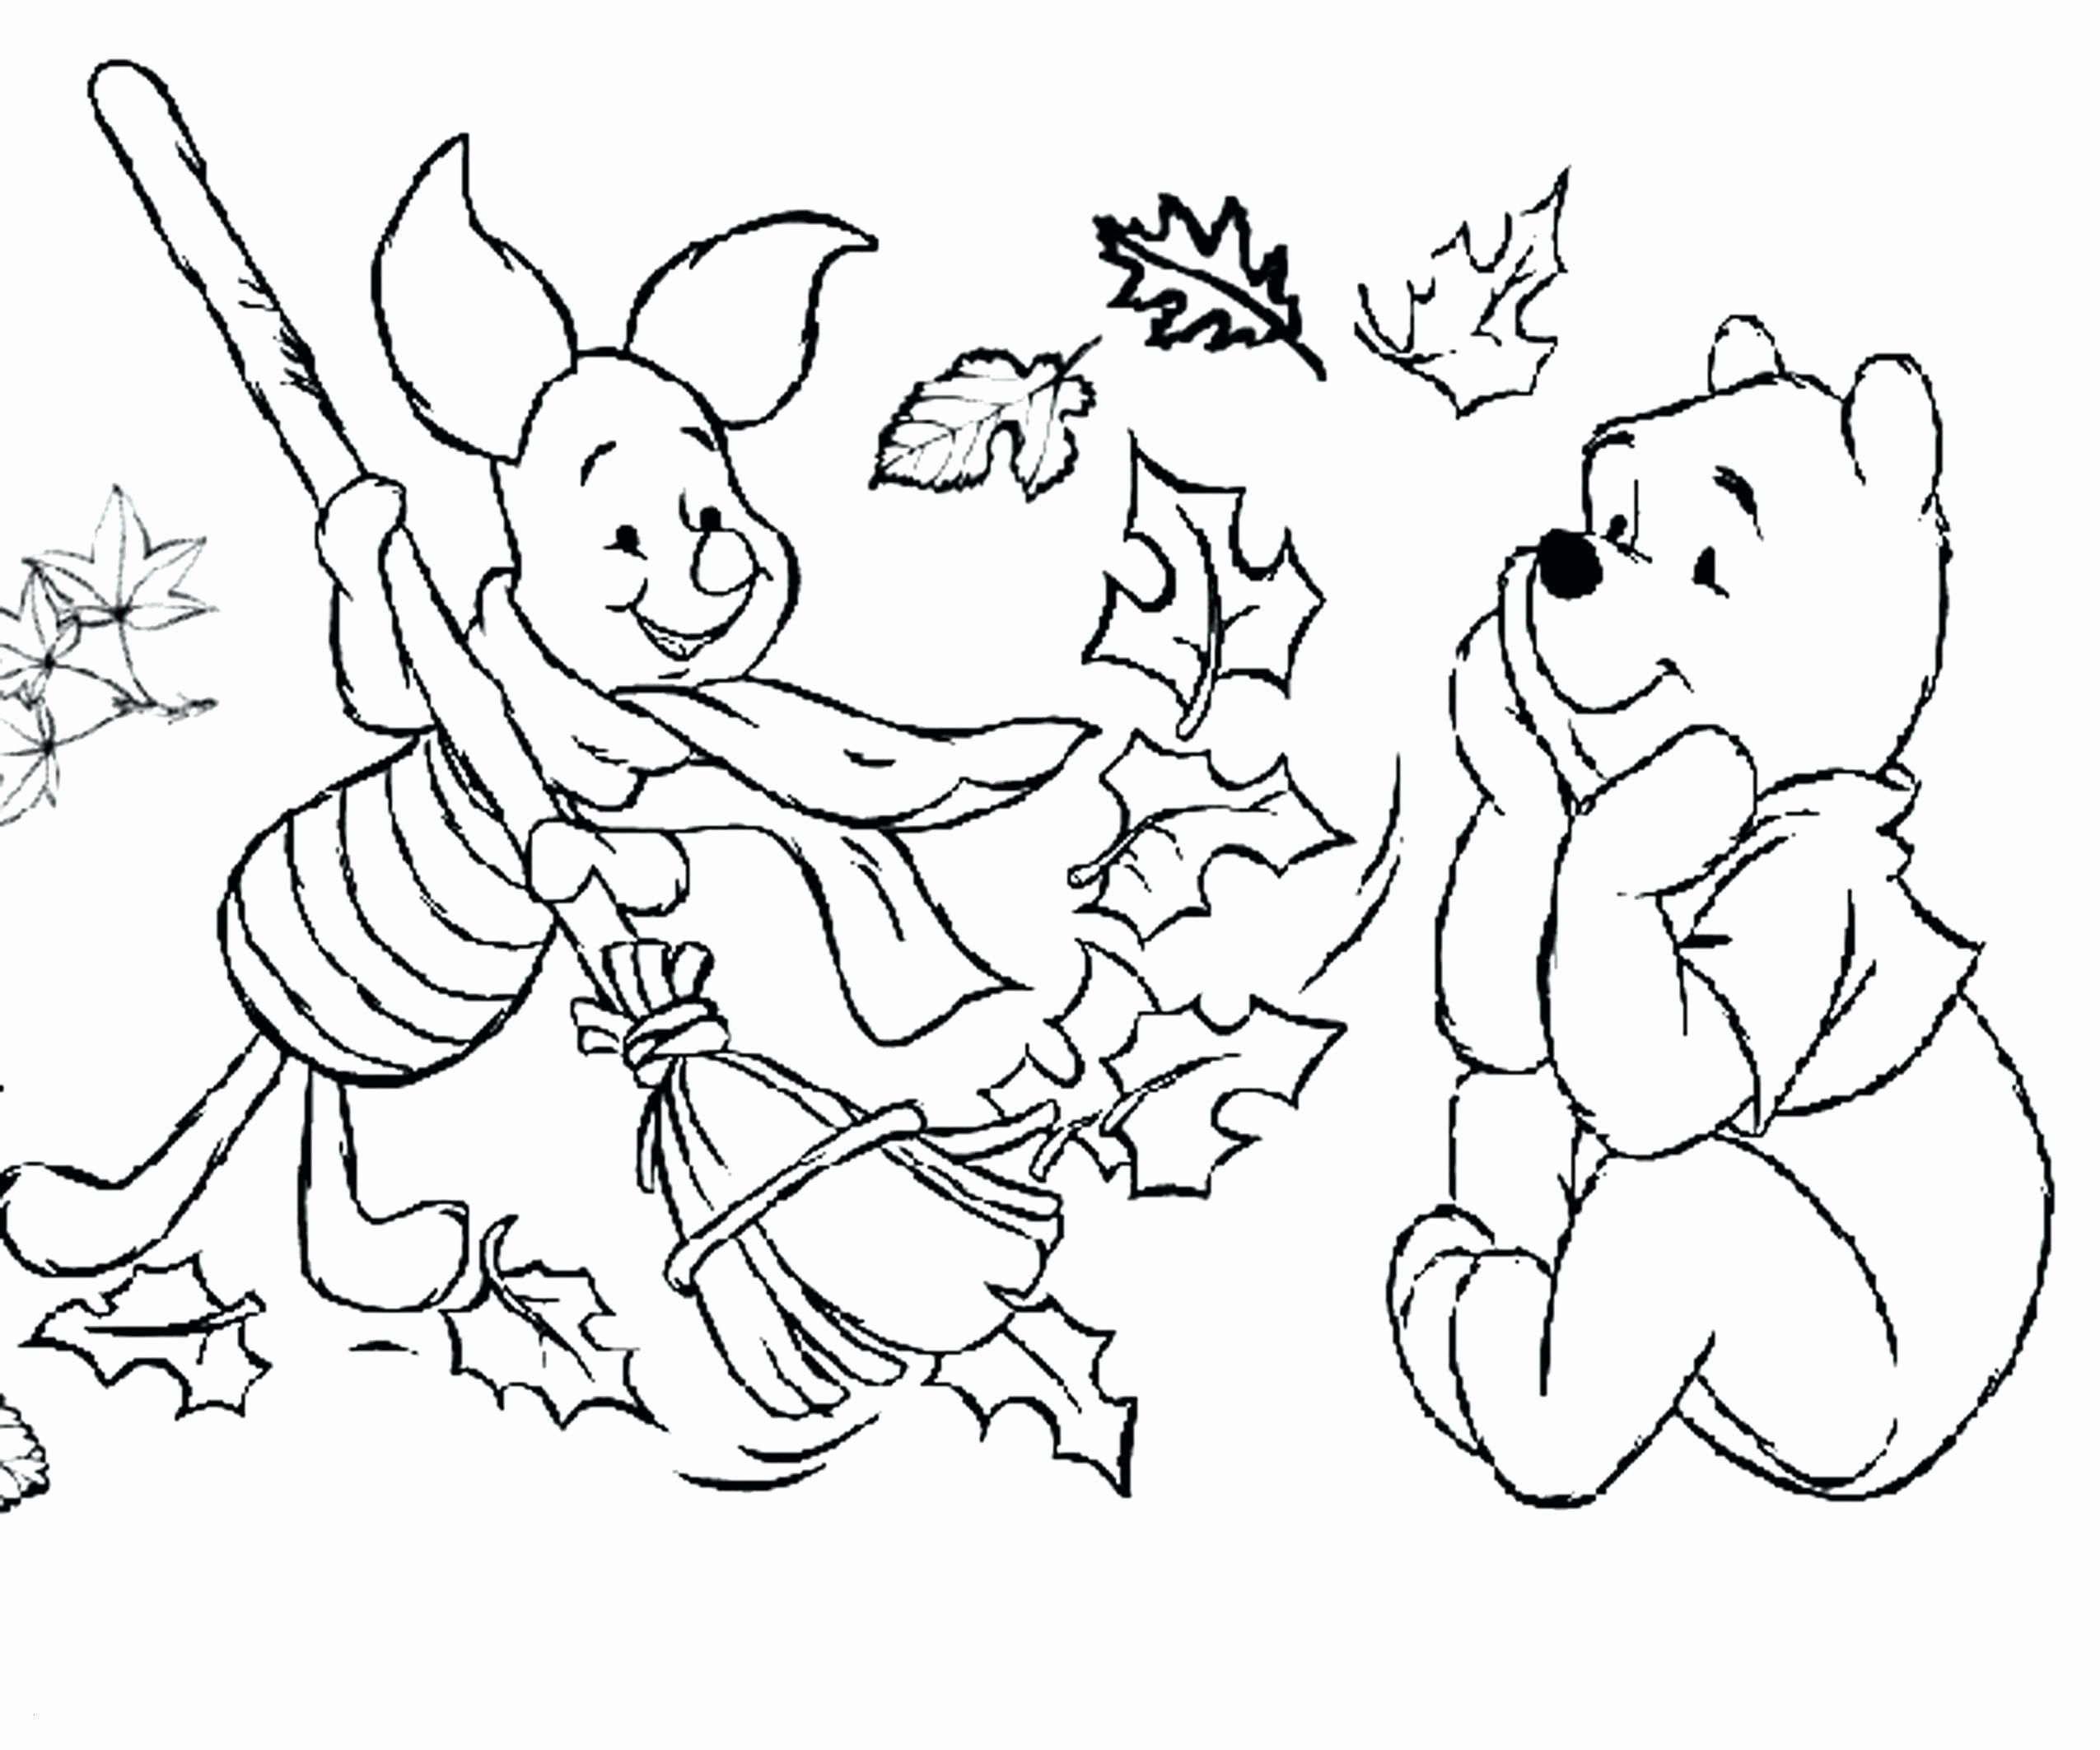 Robin Hood Kika Youtube Einzigartig Ausmalbilder I Love You Frisch Luxury sonic Coloring Pages Letramac Bild